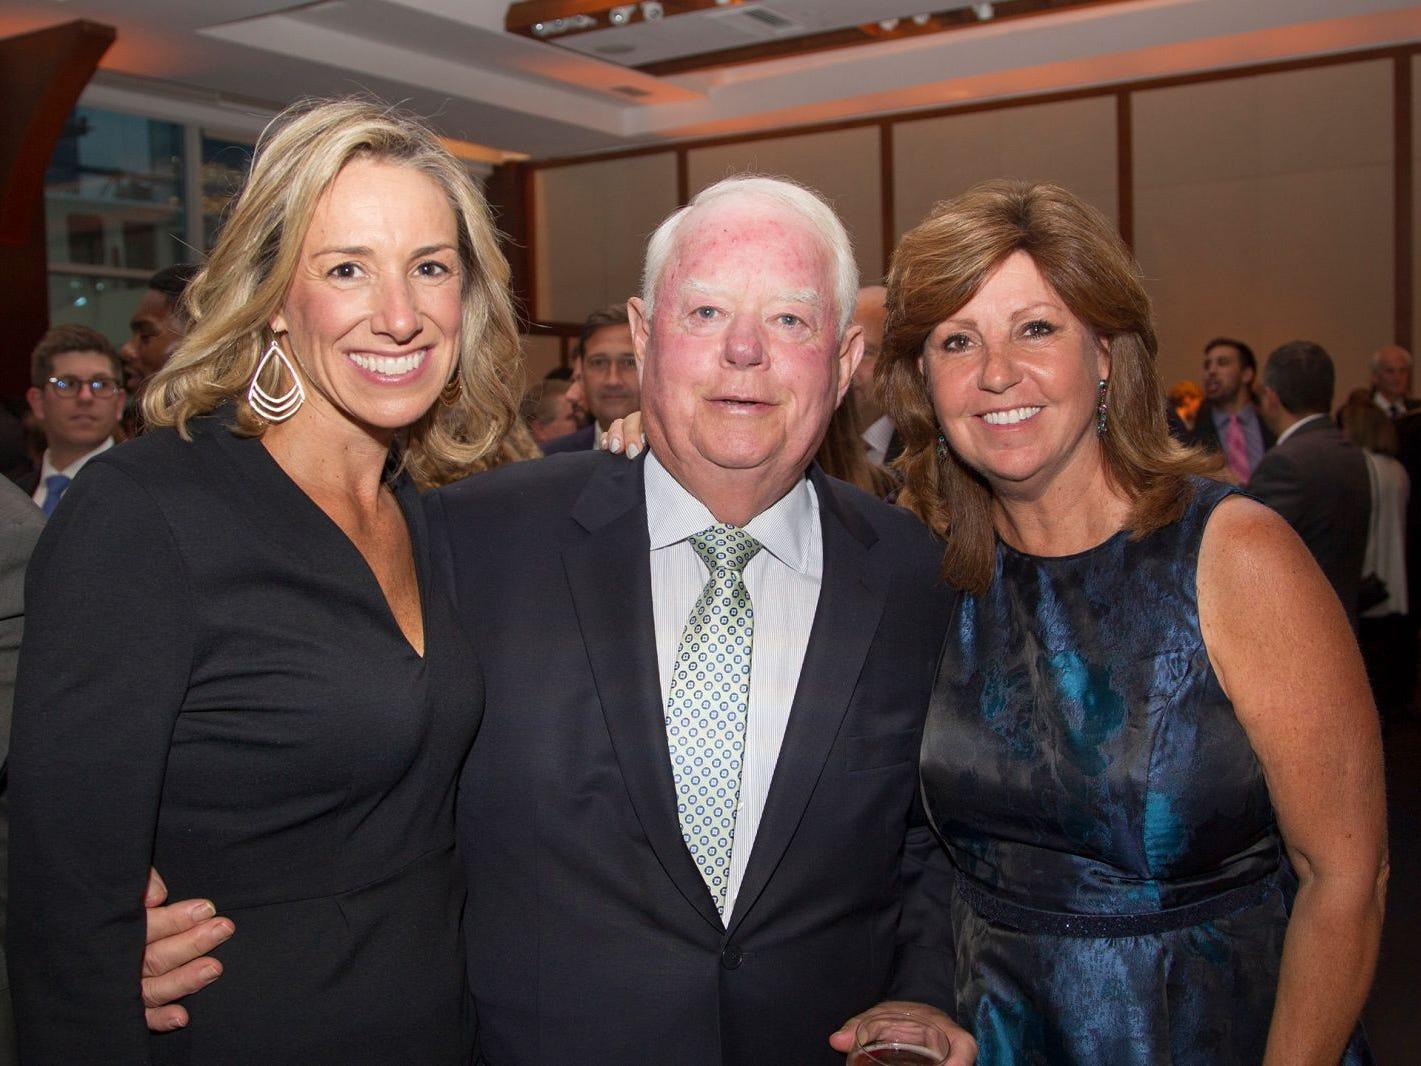 Bonnie Offerfilge, Tim and Val Reardon. 11th annual IronMatt Fundraiser Gala at Pier 60 Chelsea Piers. 09/20/2018